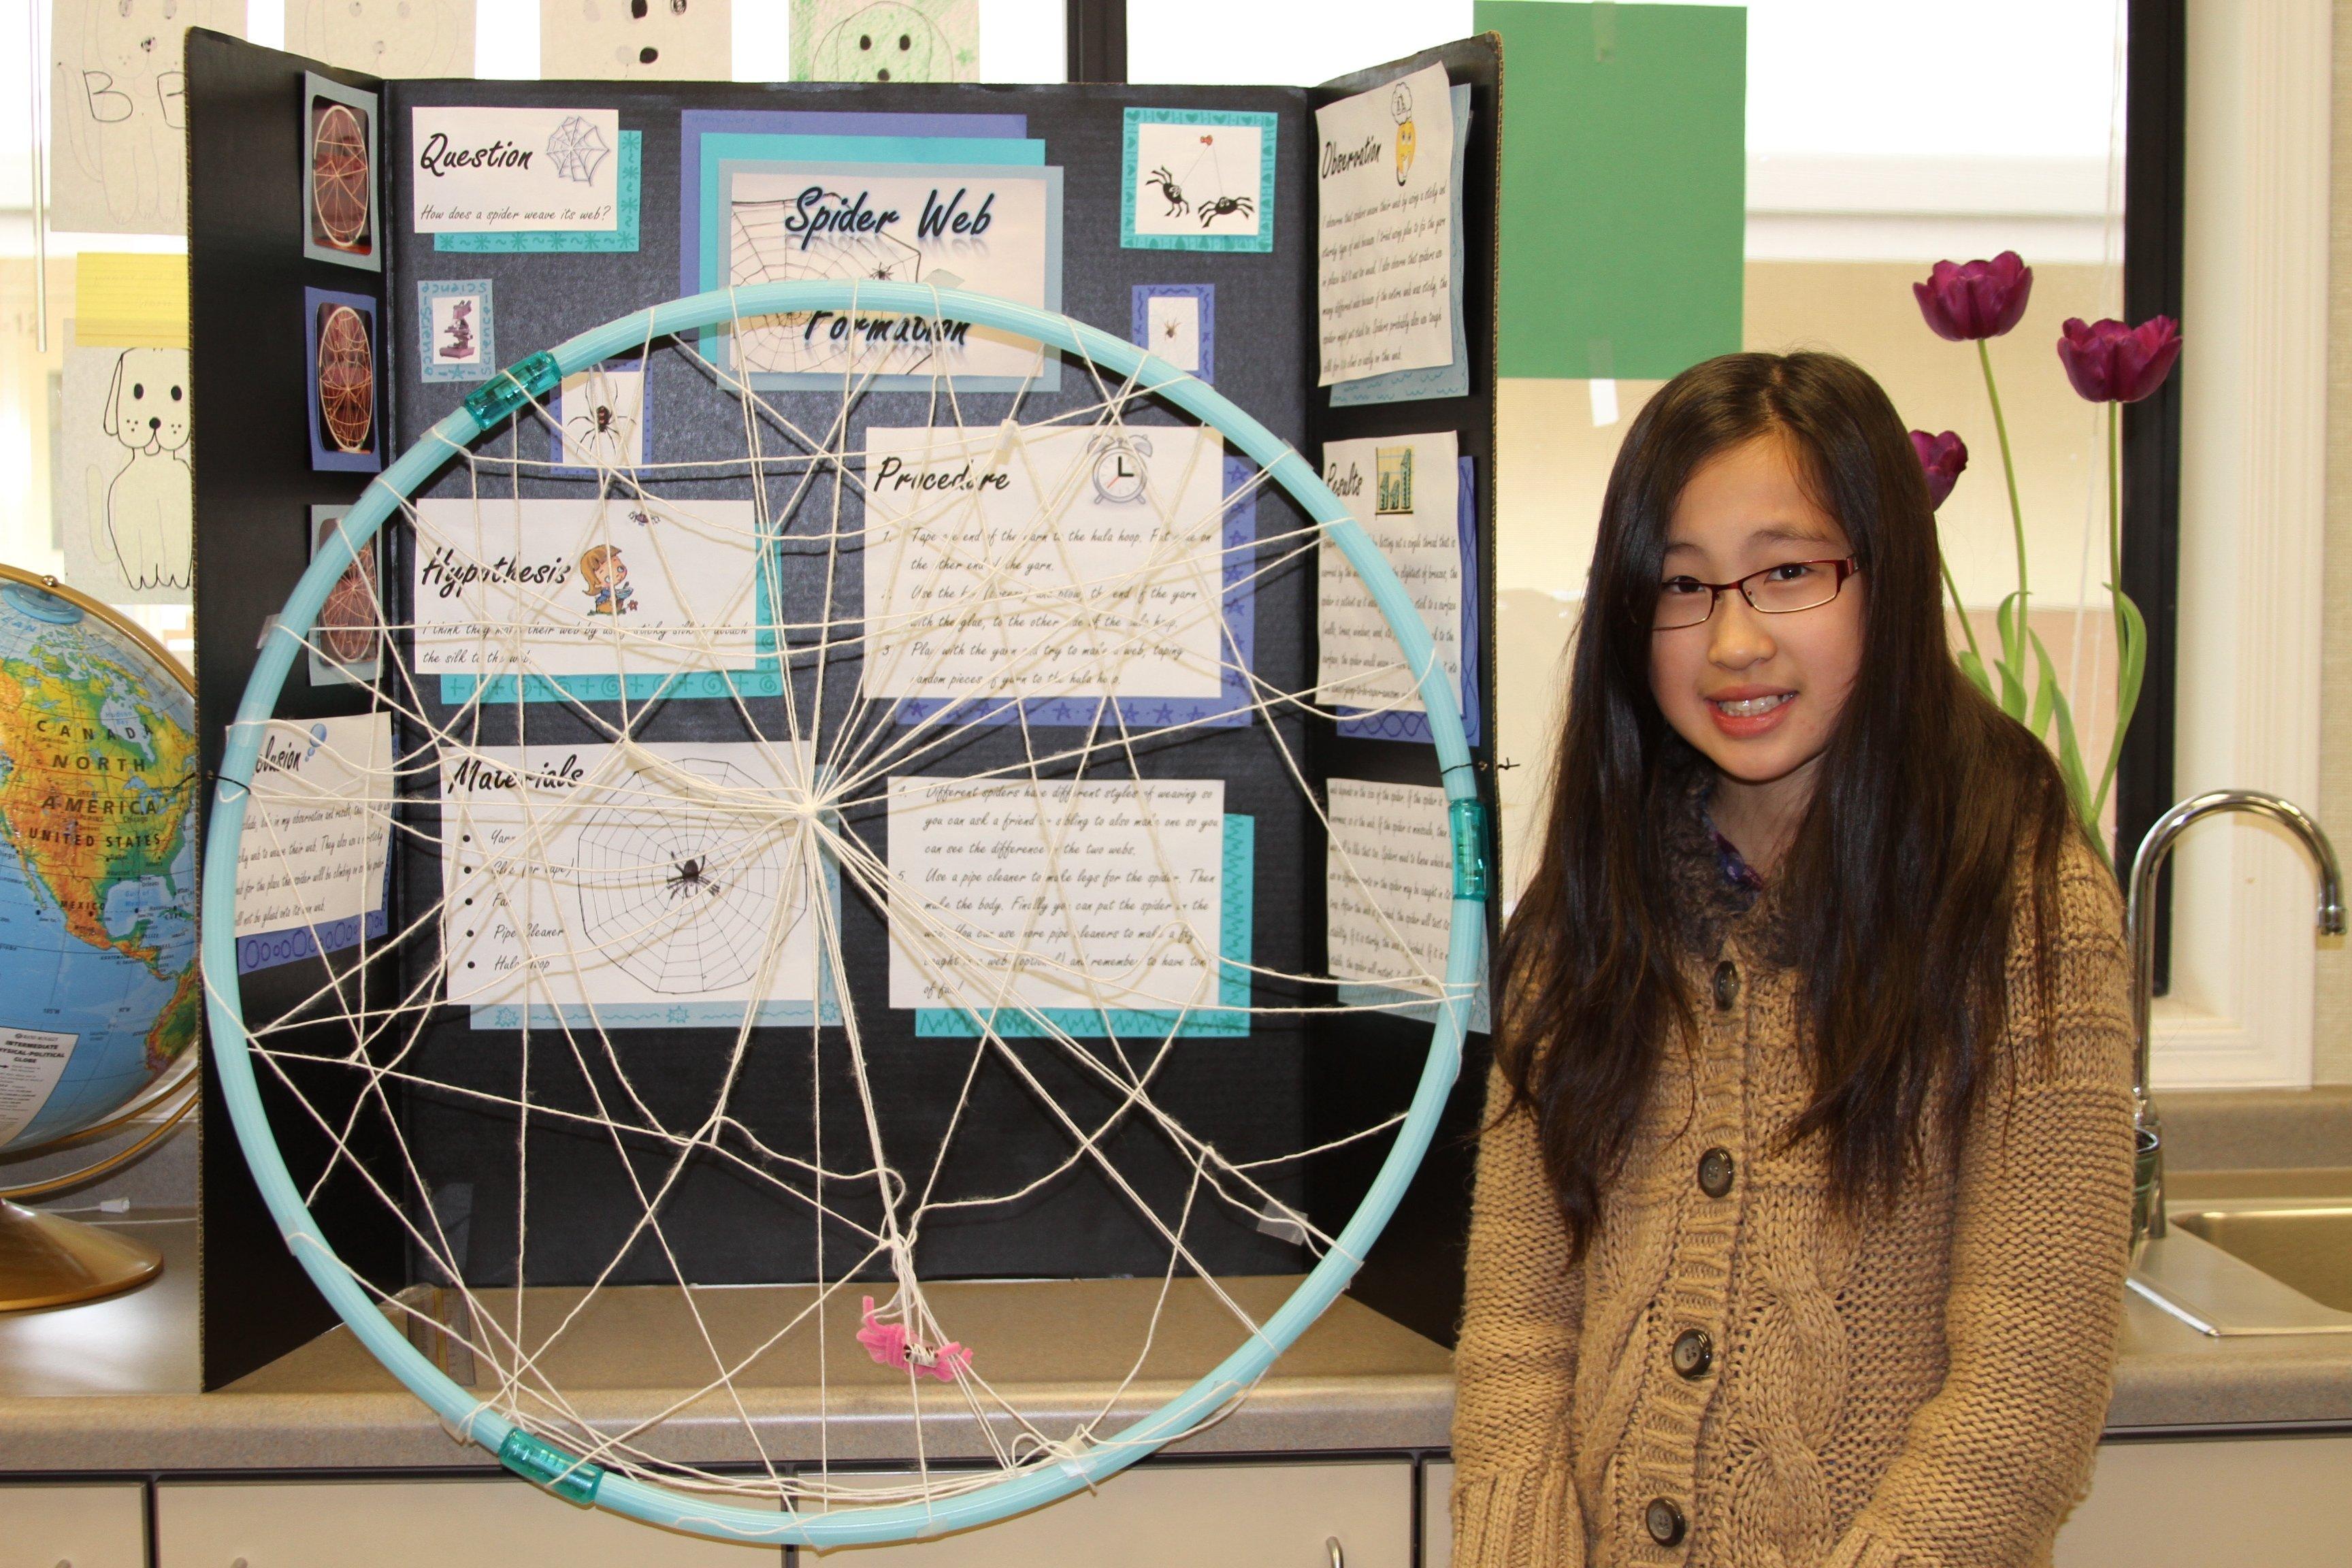 10 Pretty Elementary School Science Fair Project Ideas science fair projects about space green elementary school science 1 2020